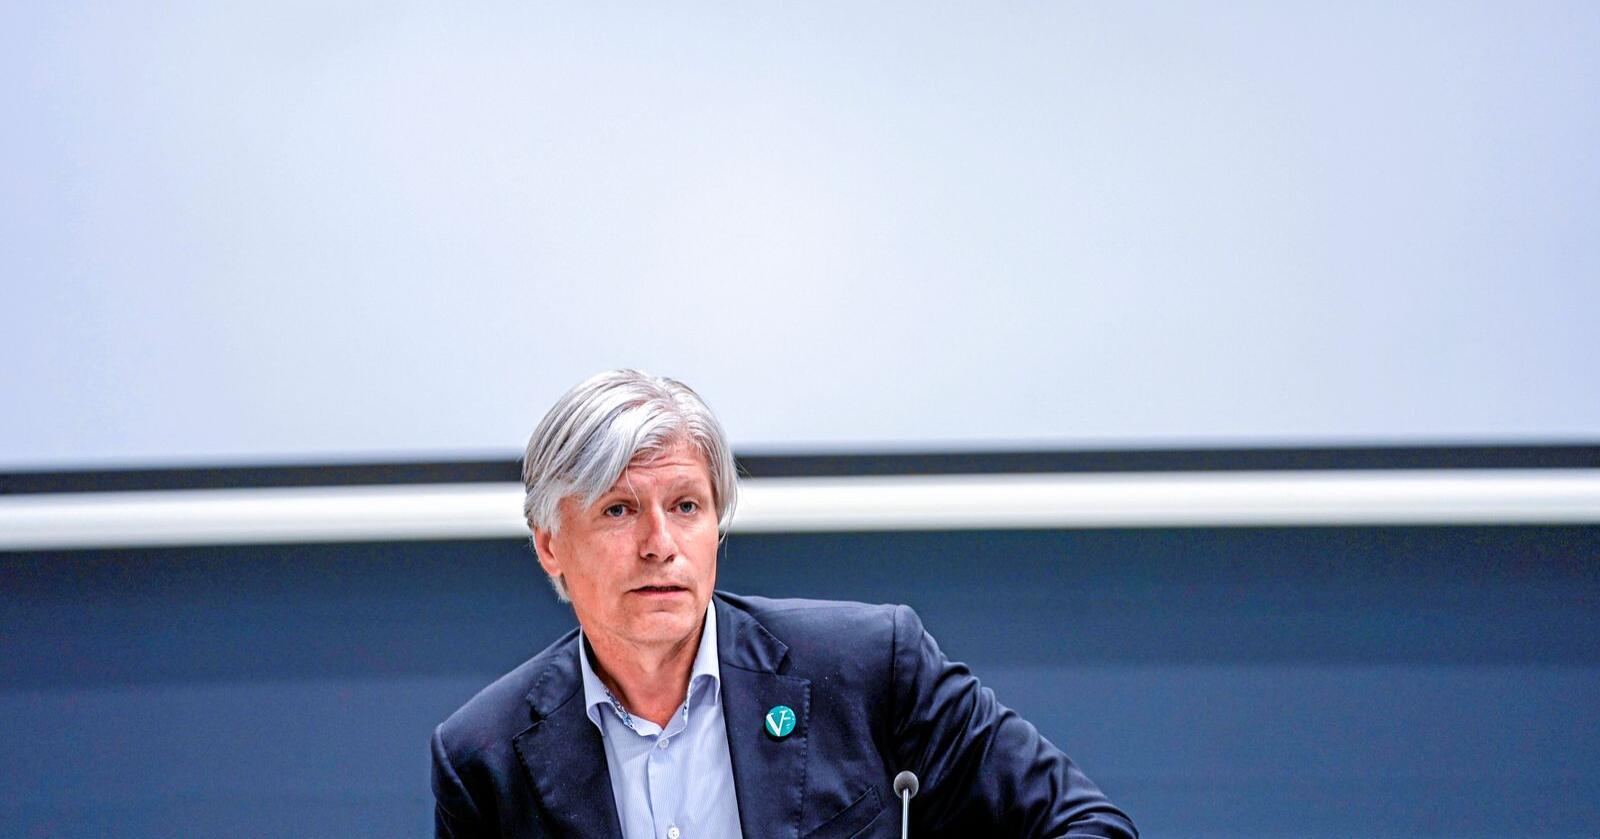 Kan få låne bøker: Klima- og miljøminister Ola Elvestuen. Foto: Stian Lysberg Solum / NTB scanpix